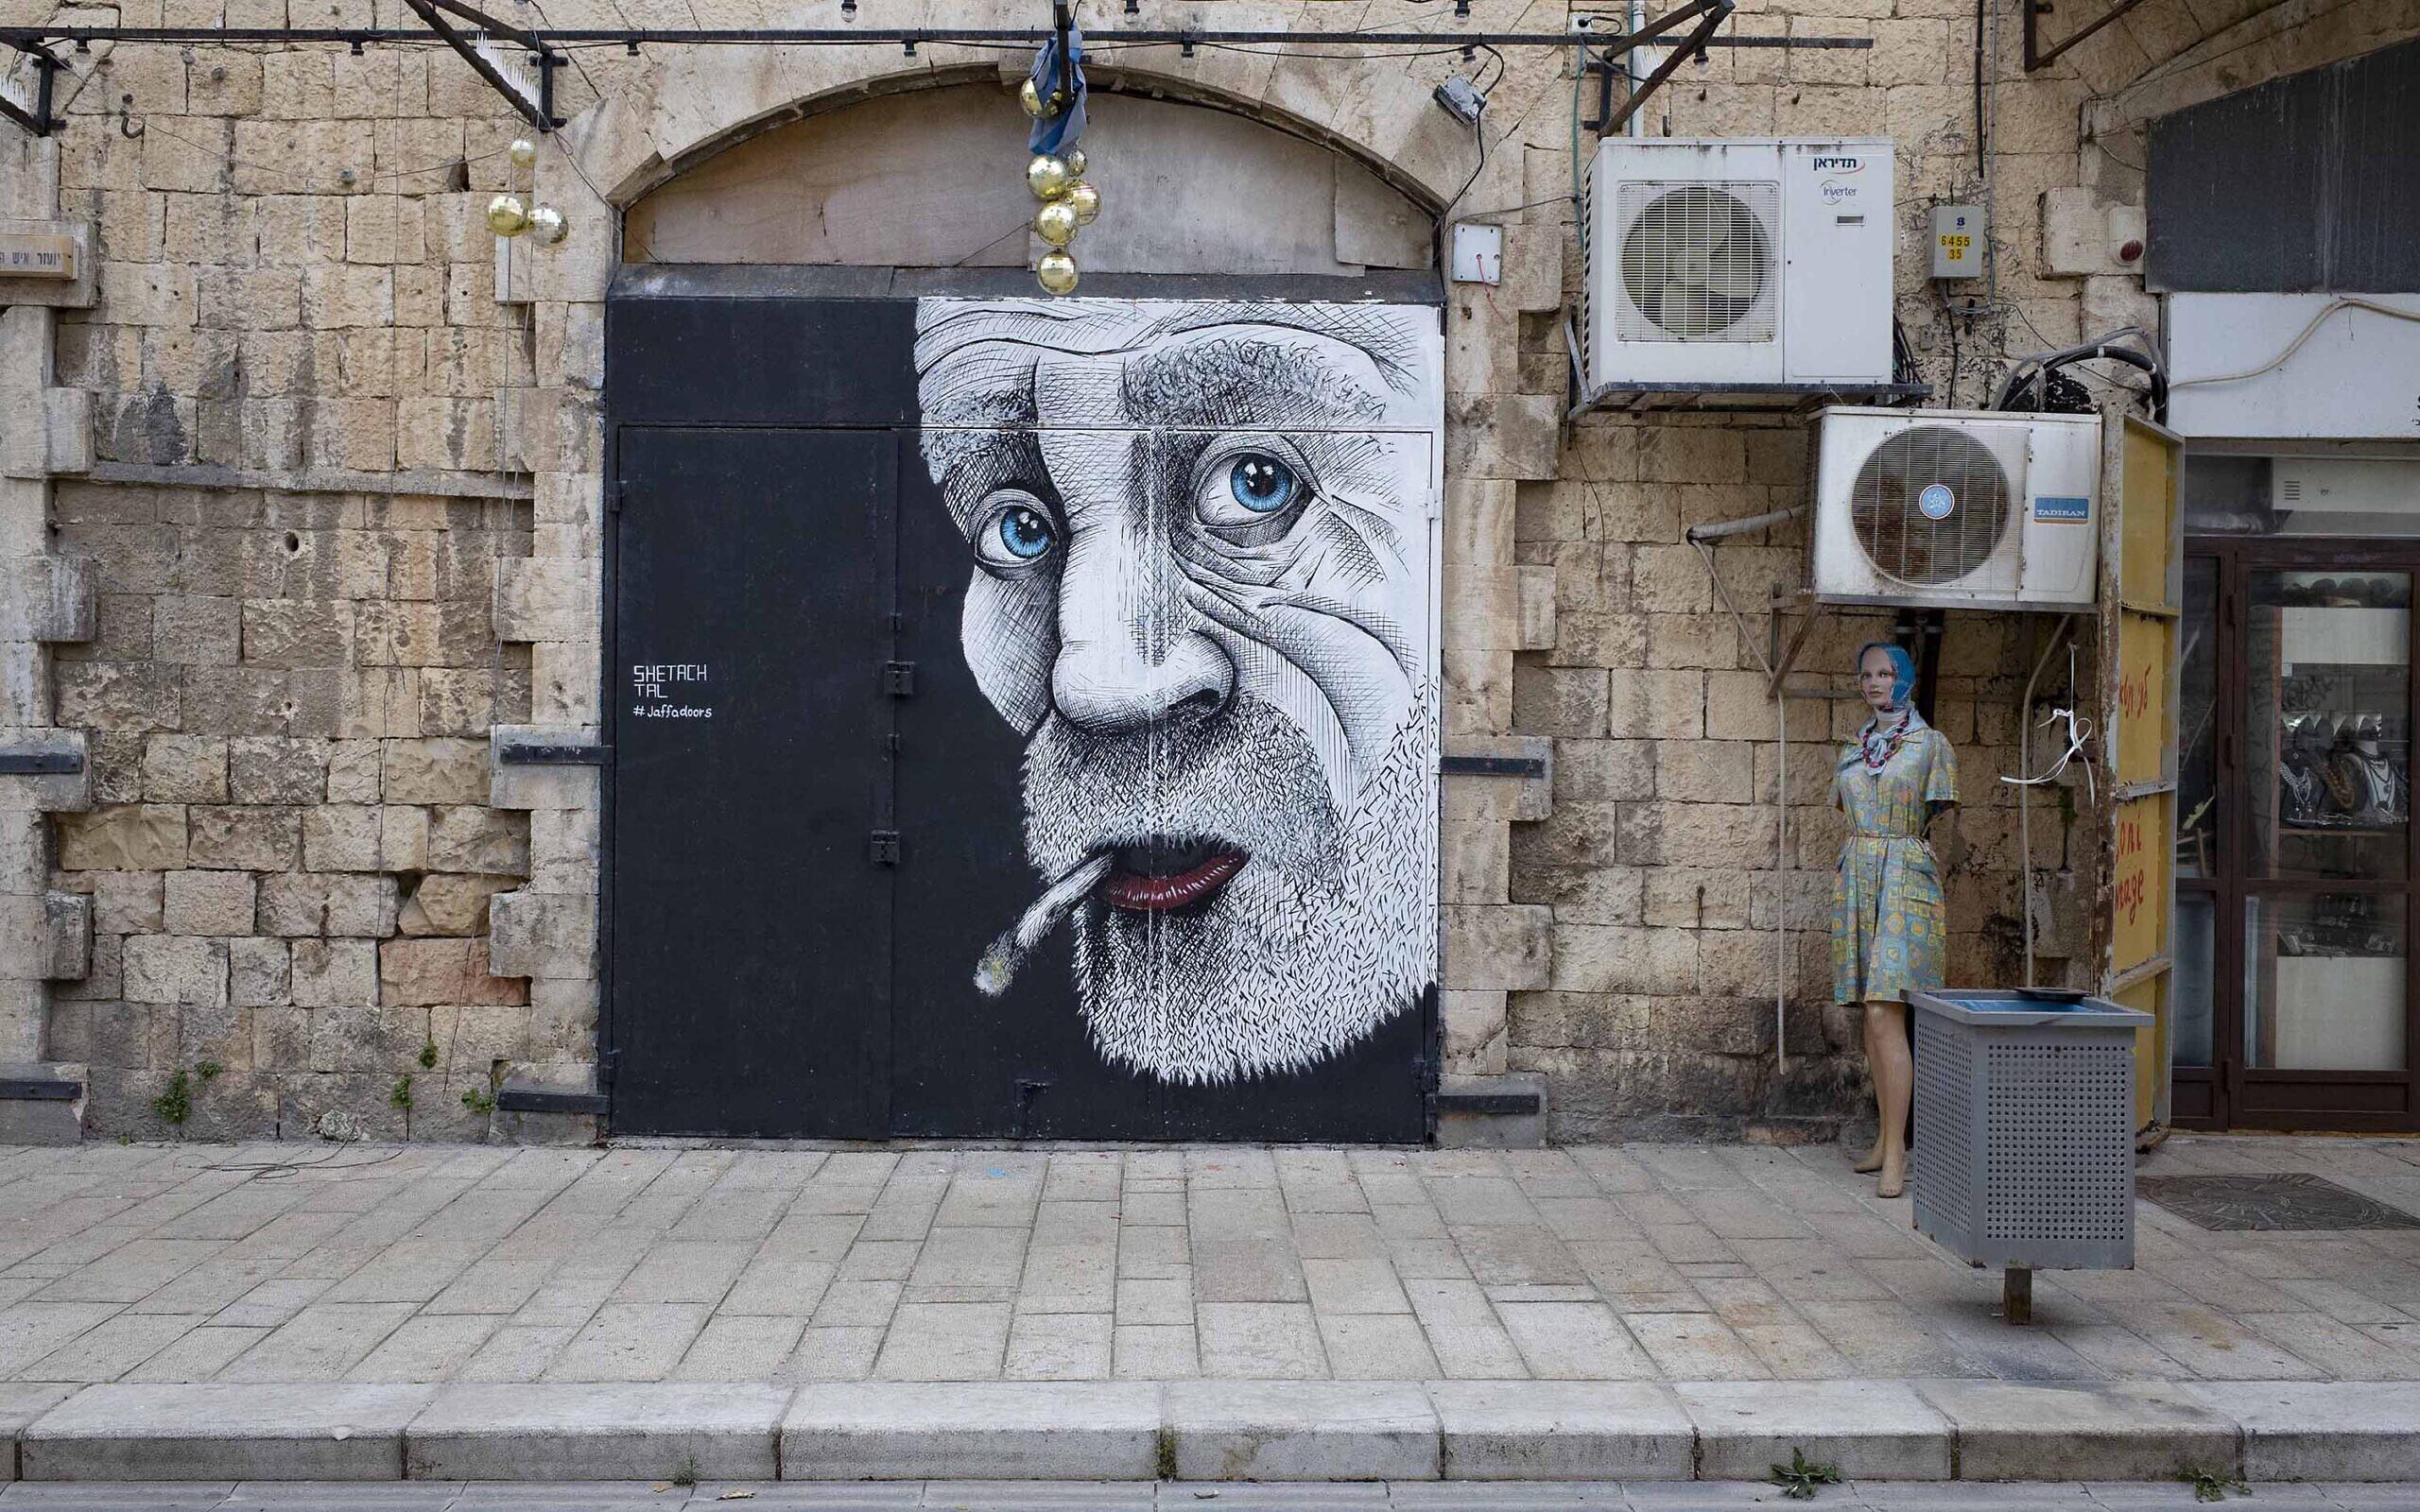 Street art in Tel Aviv by Shetach Tal for the #Jaffadoors project. (Lord K2)